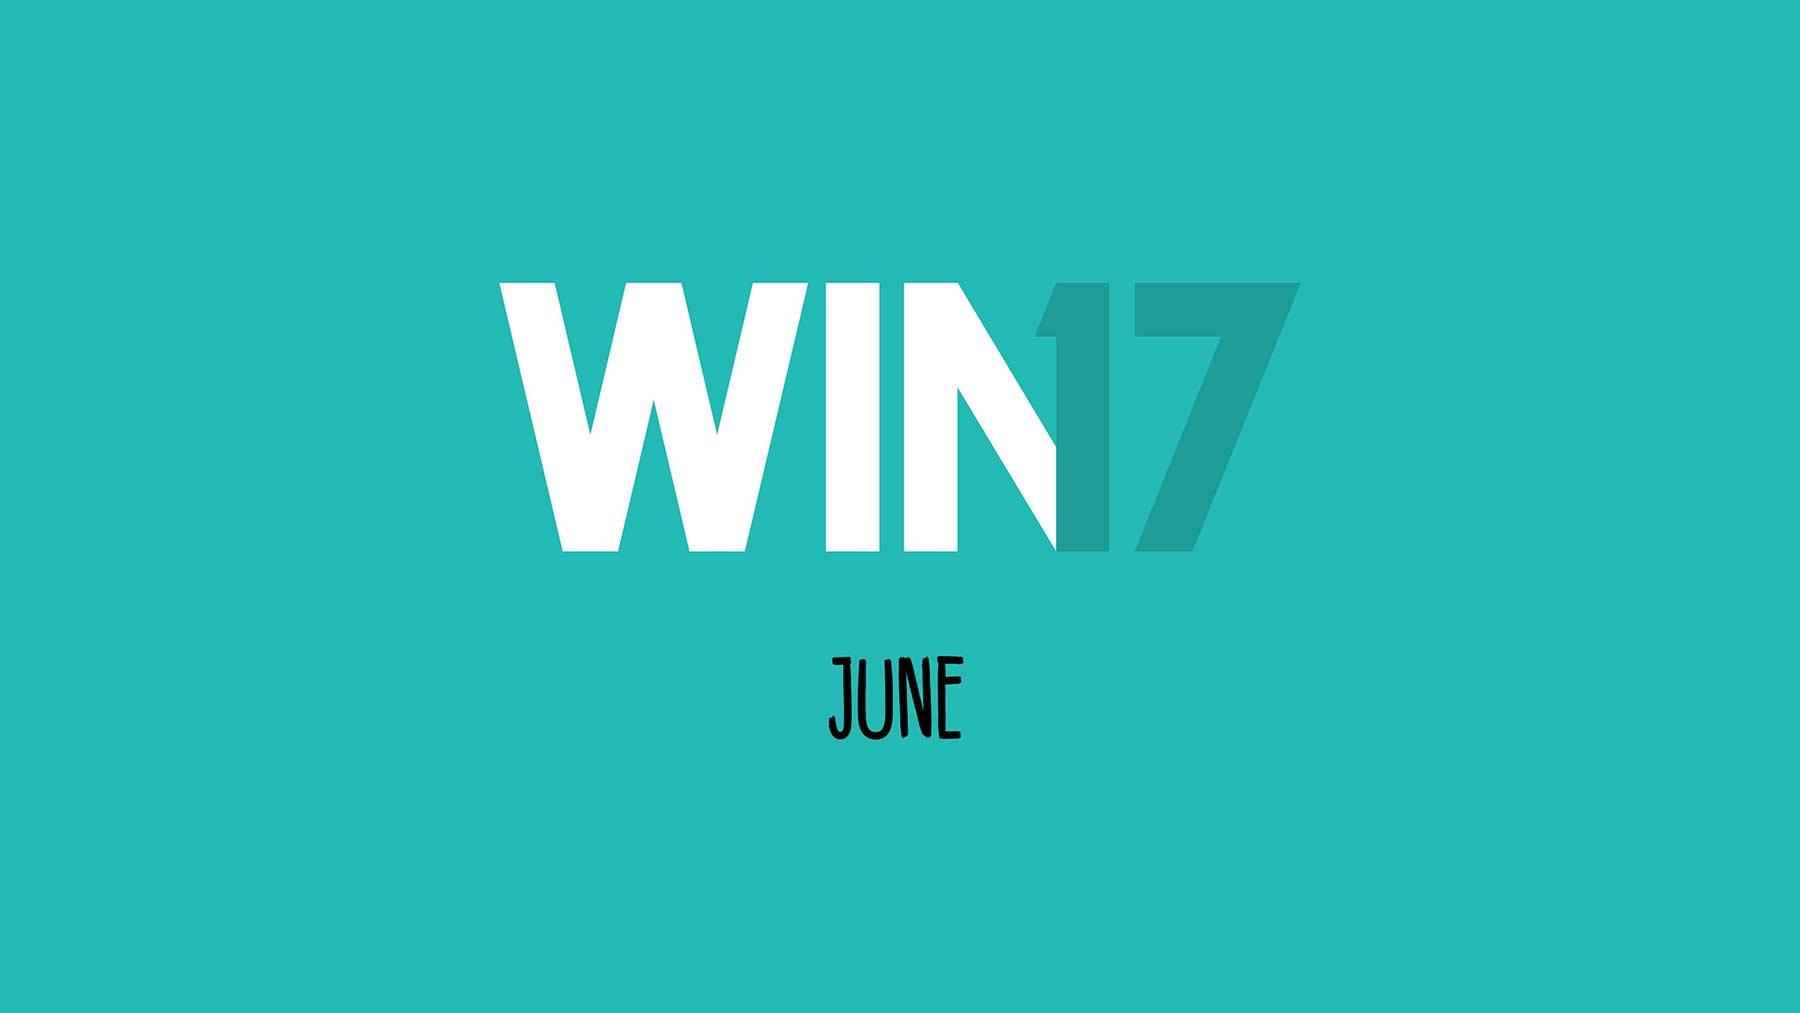 WIN Compilation Juni 2017 WIN_2017-06_00